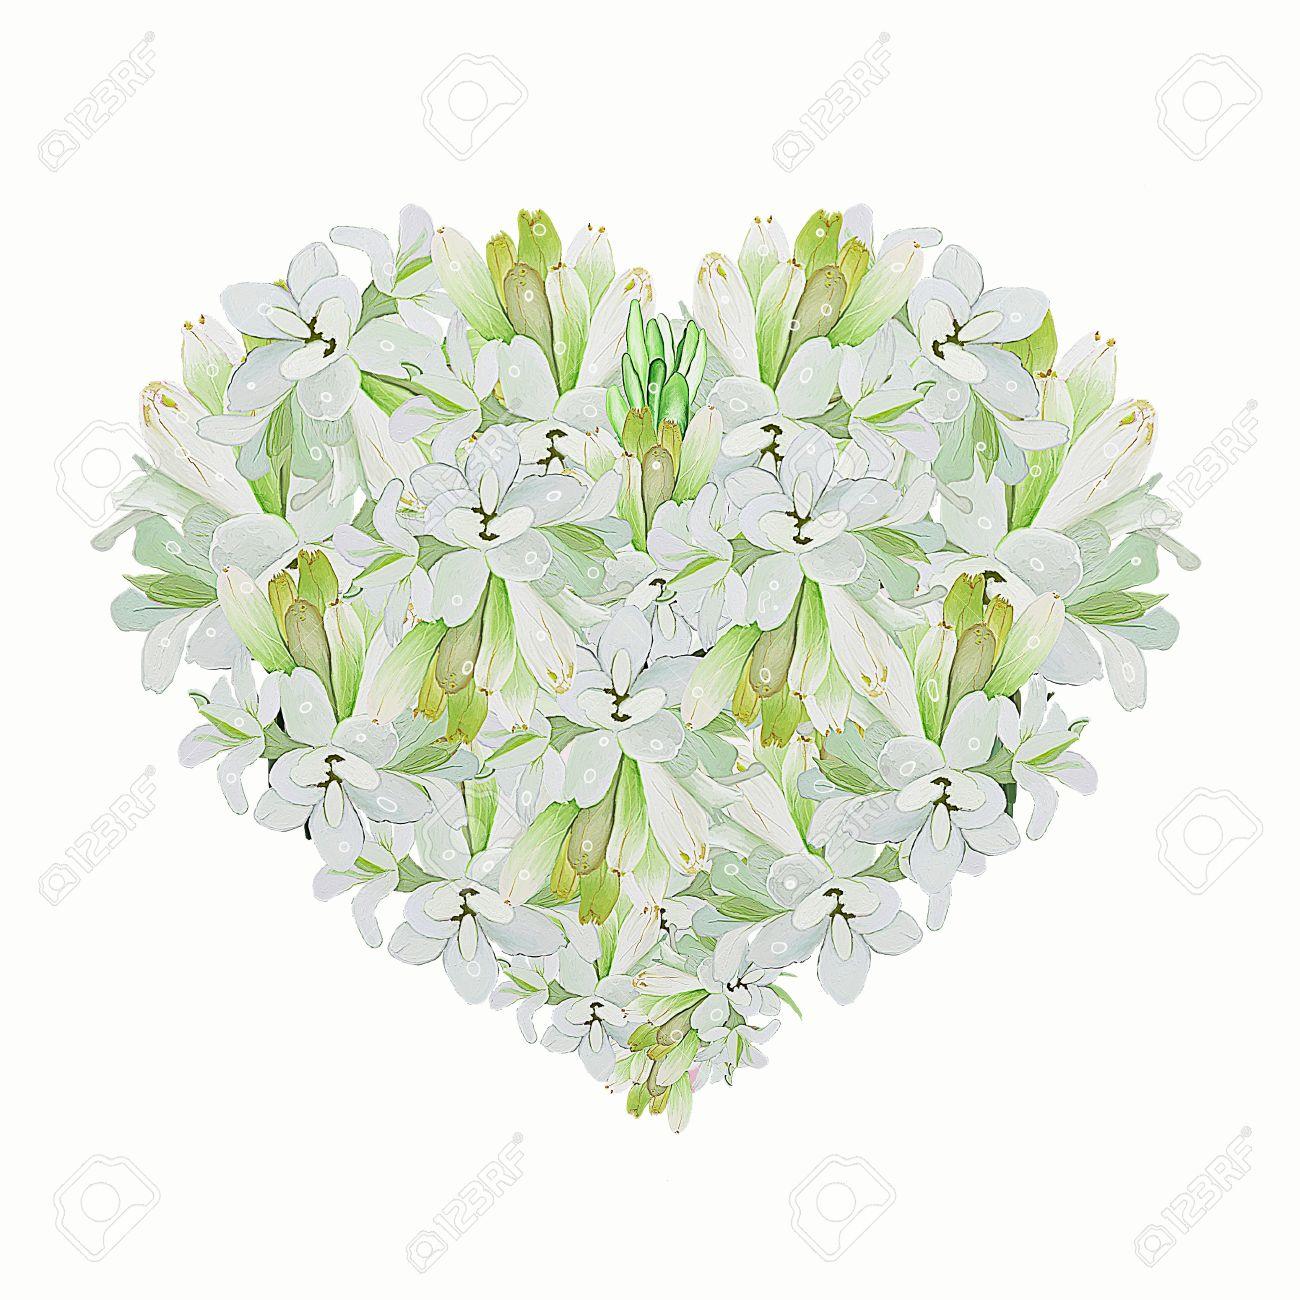 A Beautiful Heart Shape Of White Tuberose Flower On A White